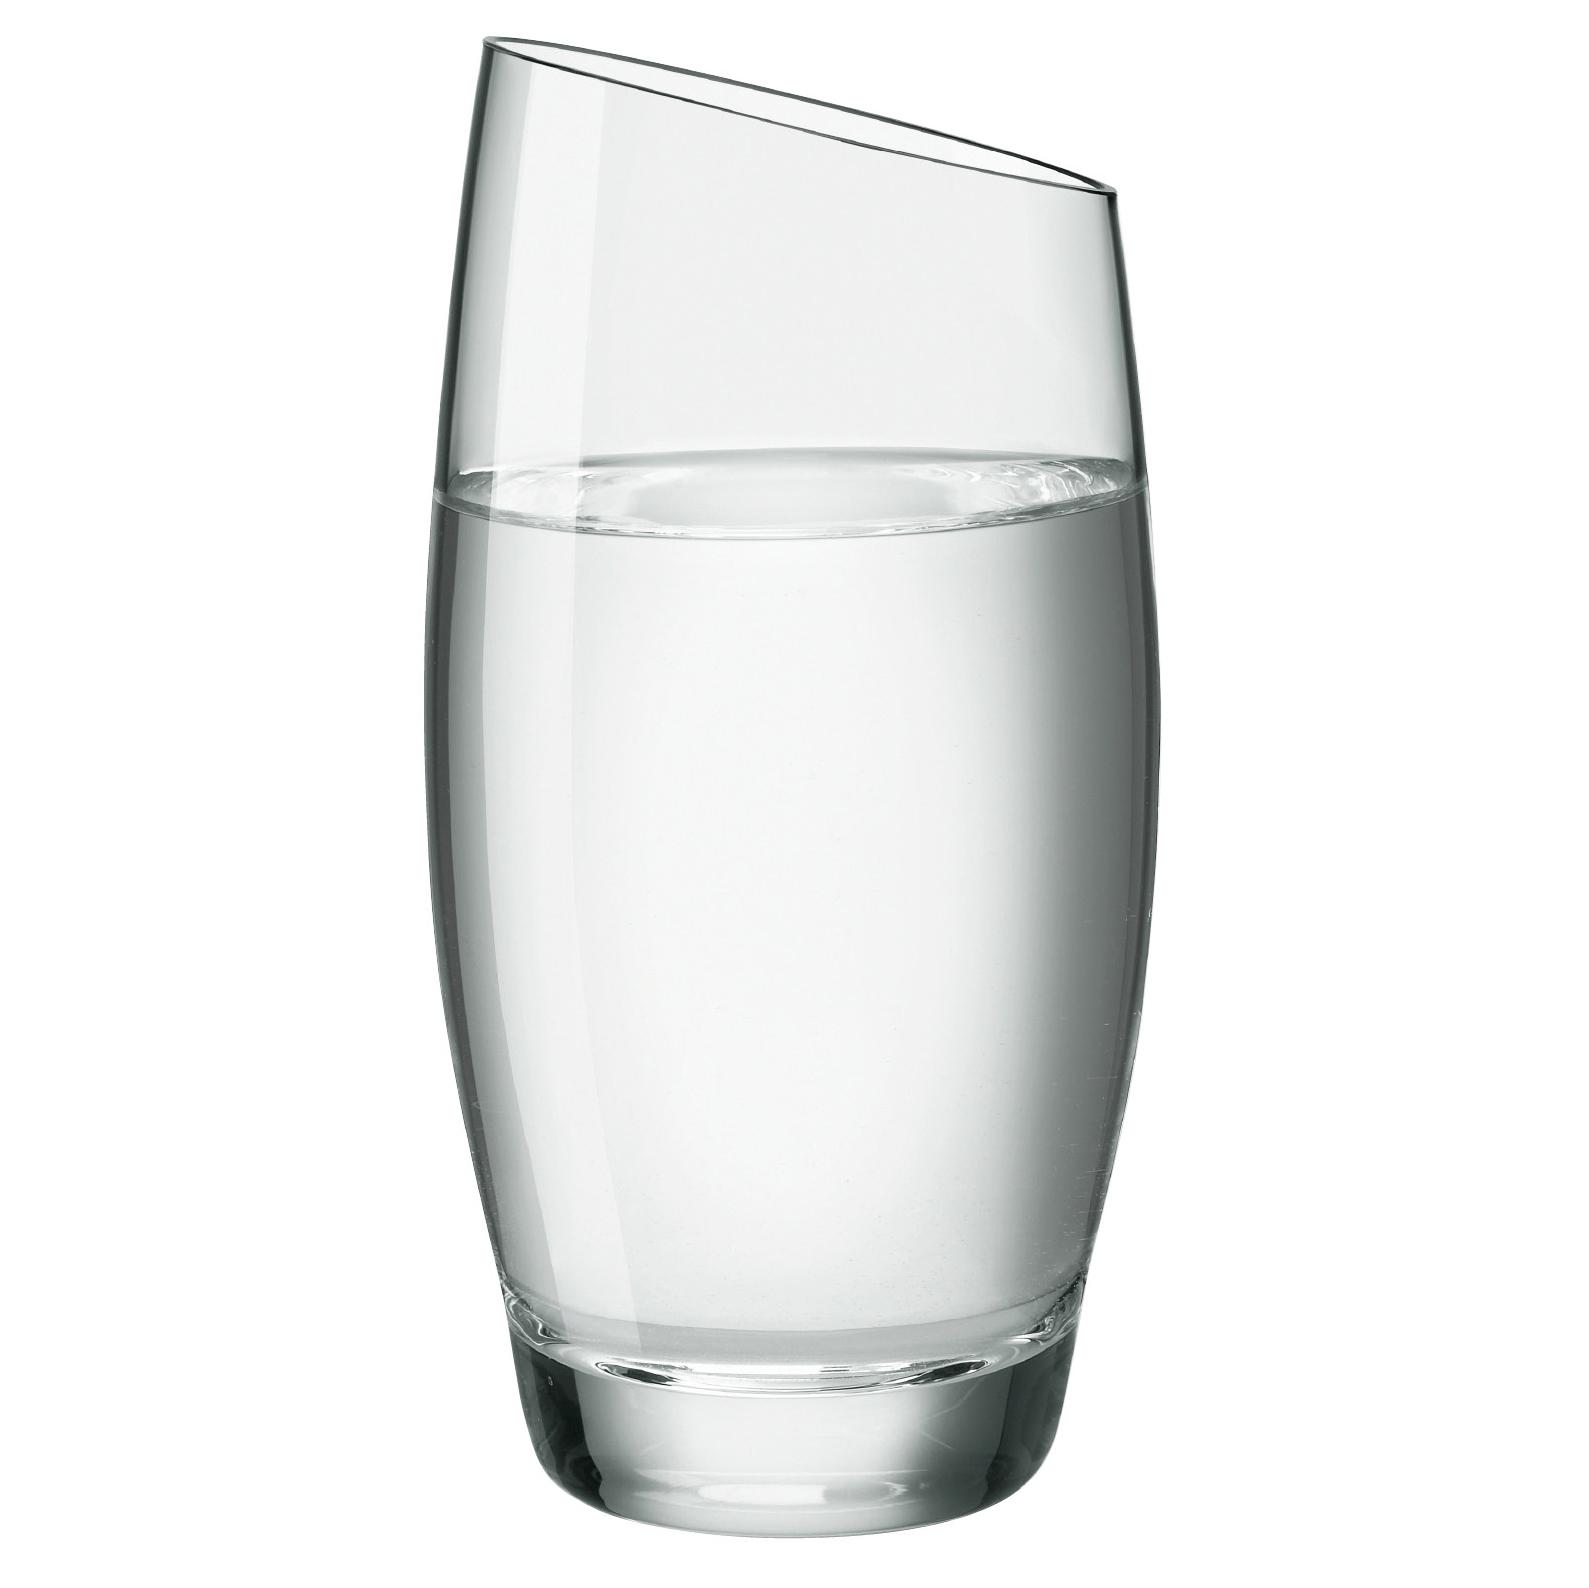 Vattenglas 35 cl